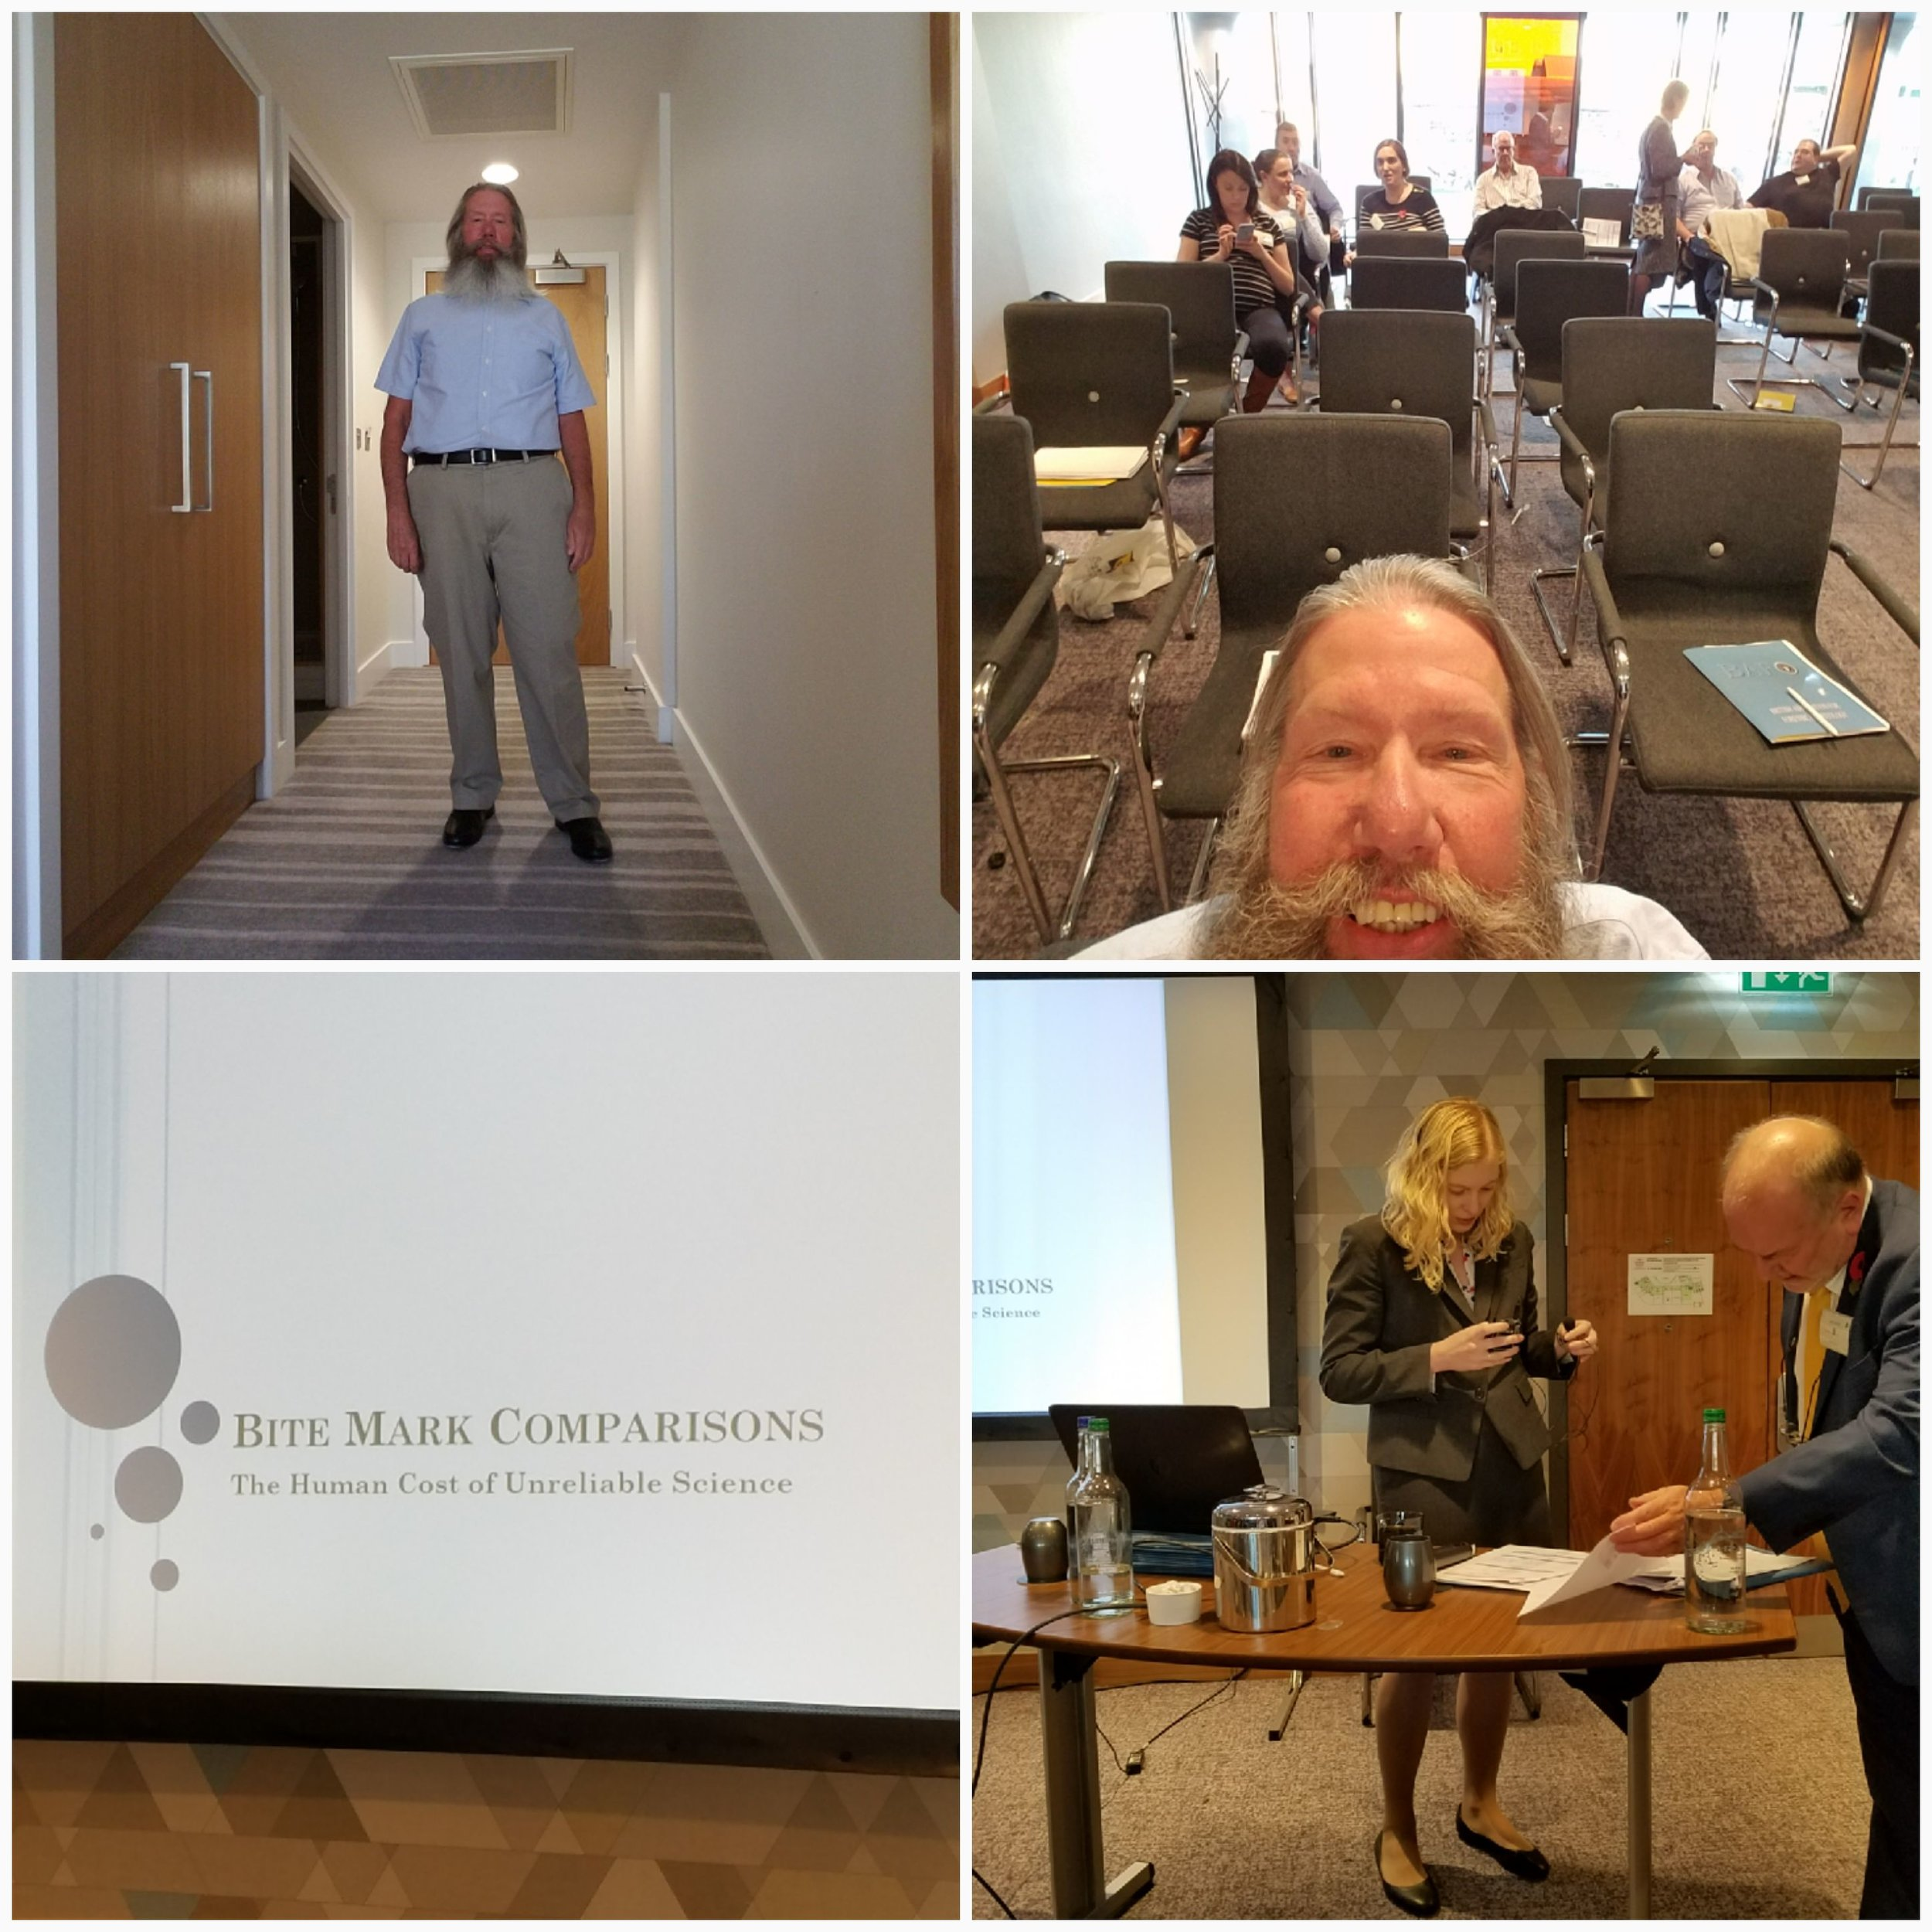 Keith A. Harward  Bite Mark Comparisons.jpg